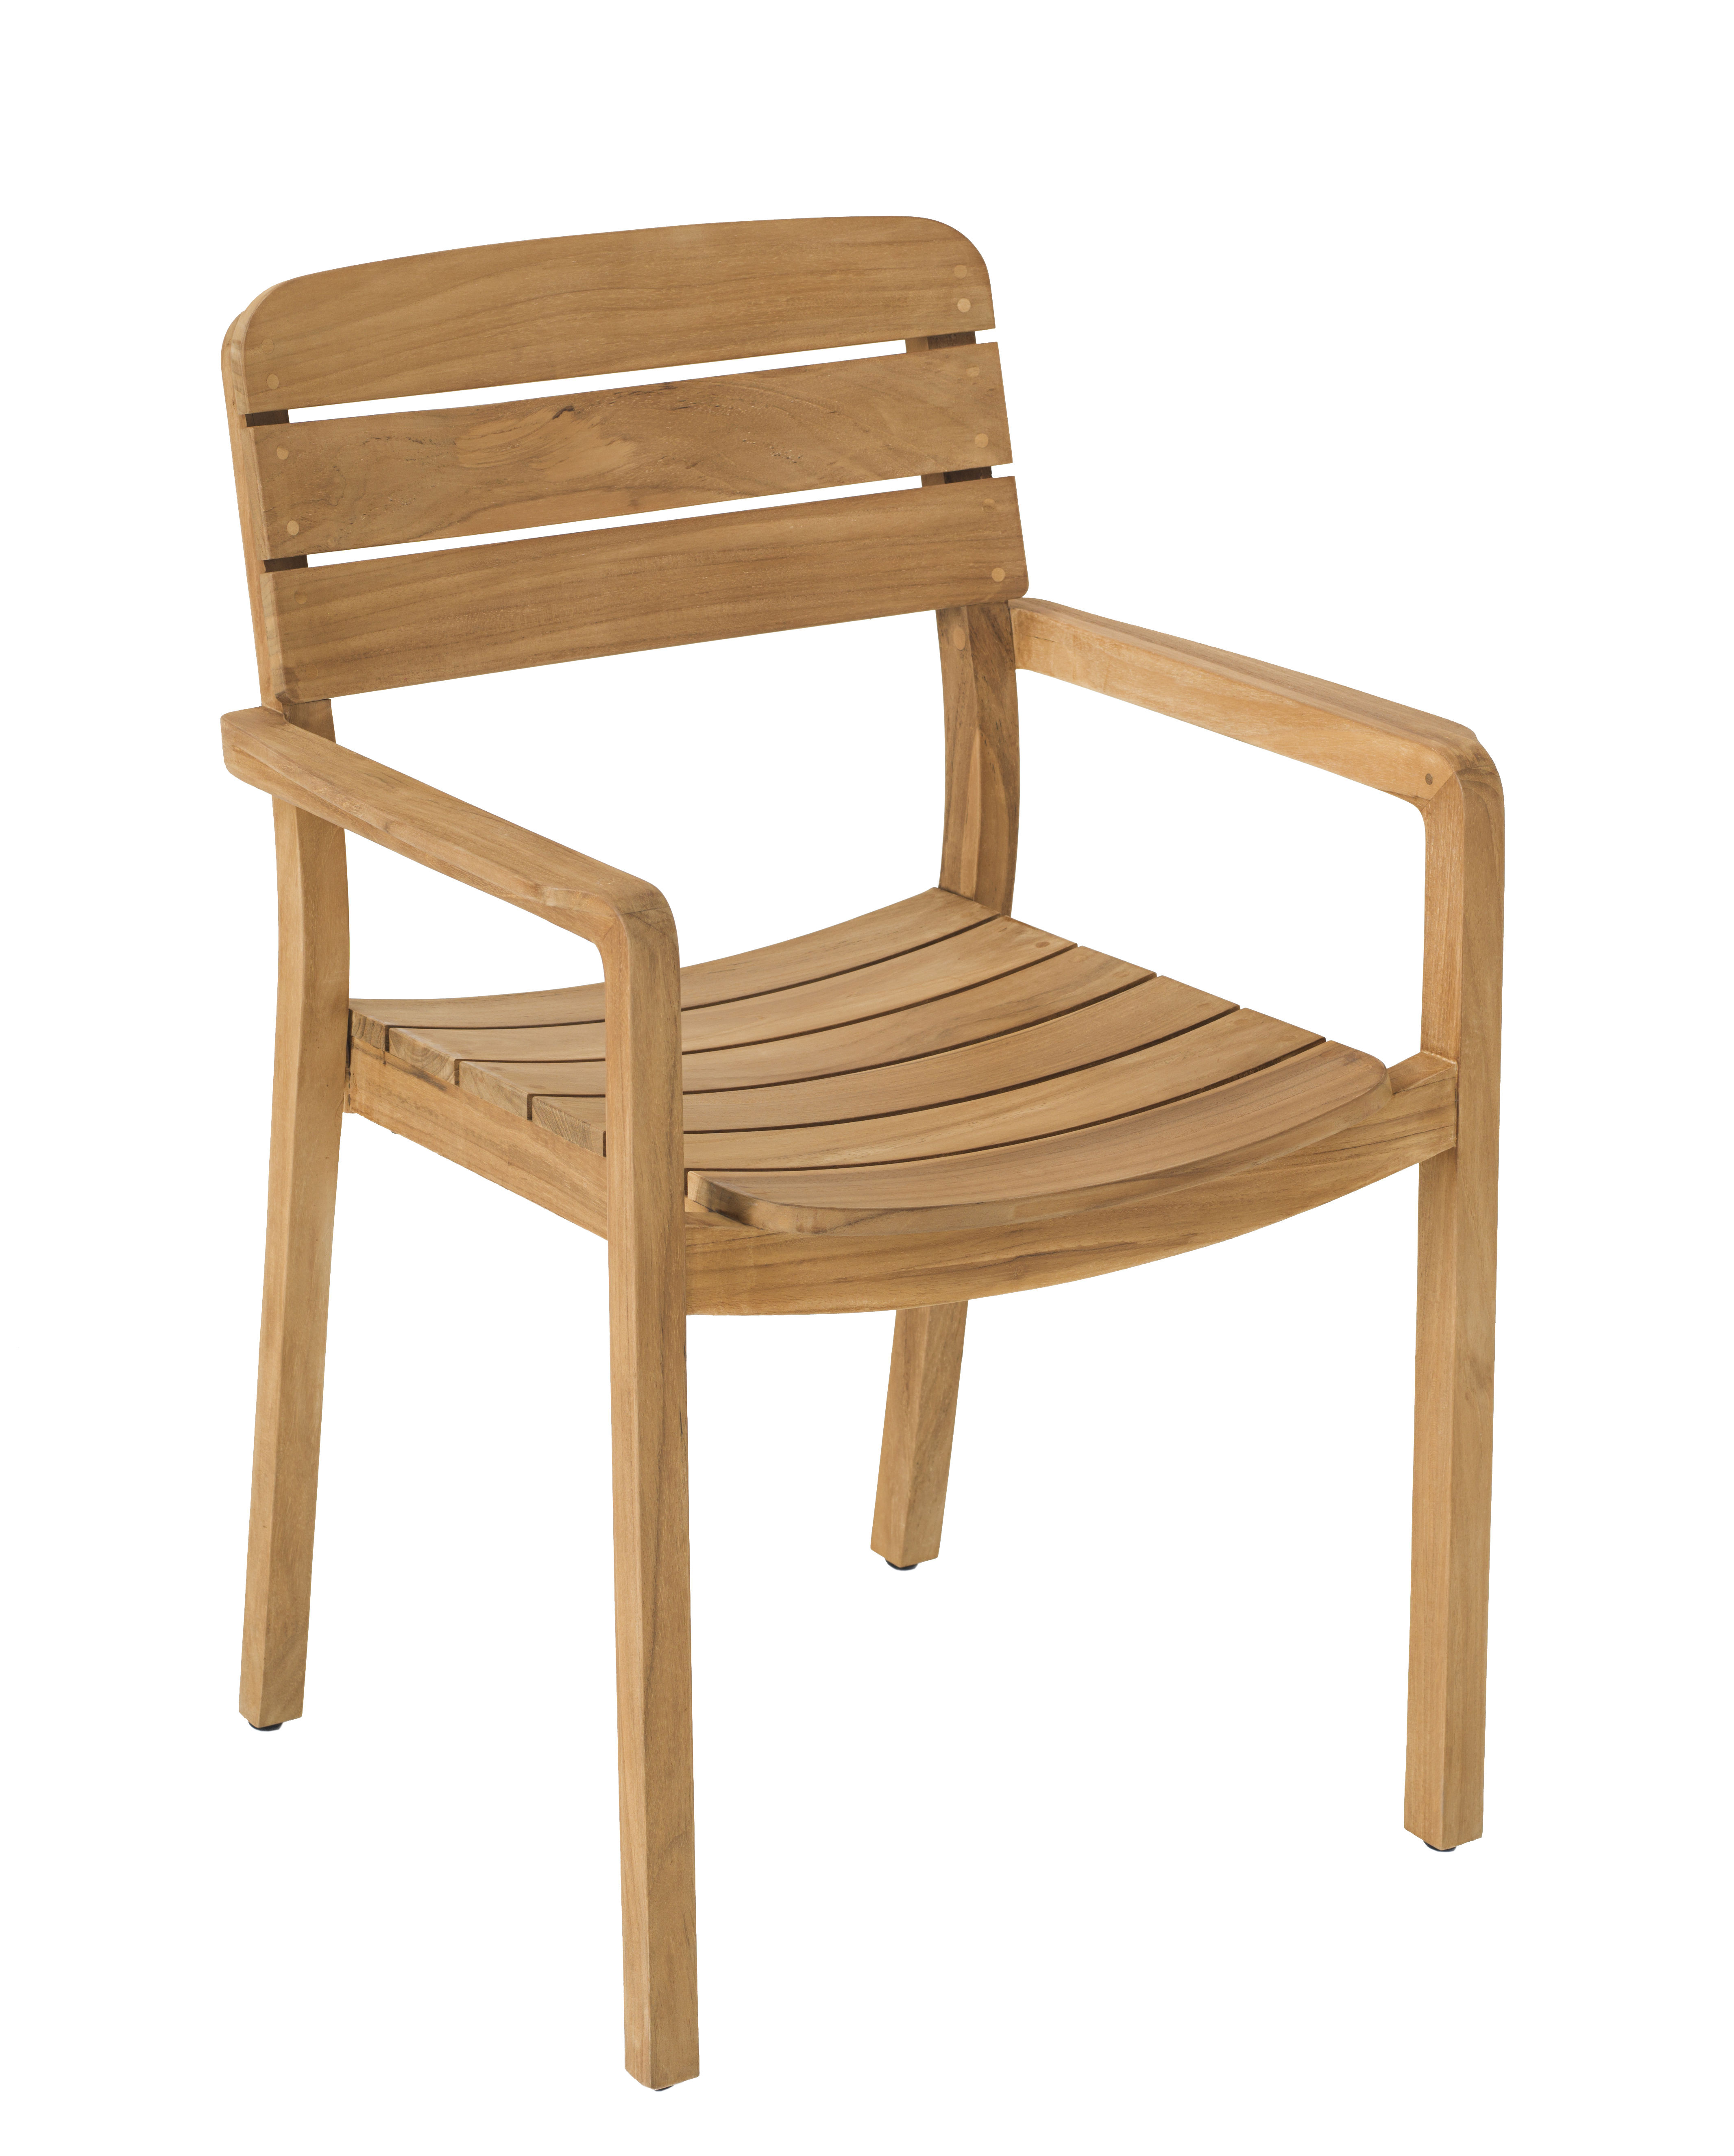 Furniture - Chairs - Lodge Stackable armchair - / Teak by Vlaemynck - Teak - Unoiled teak